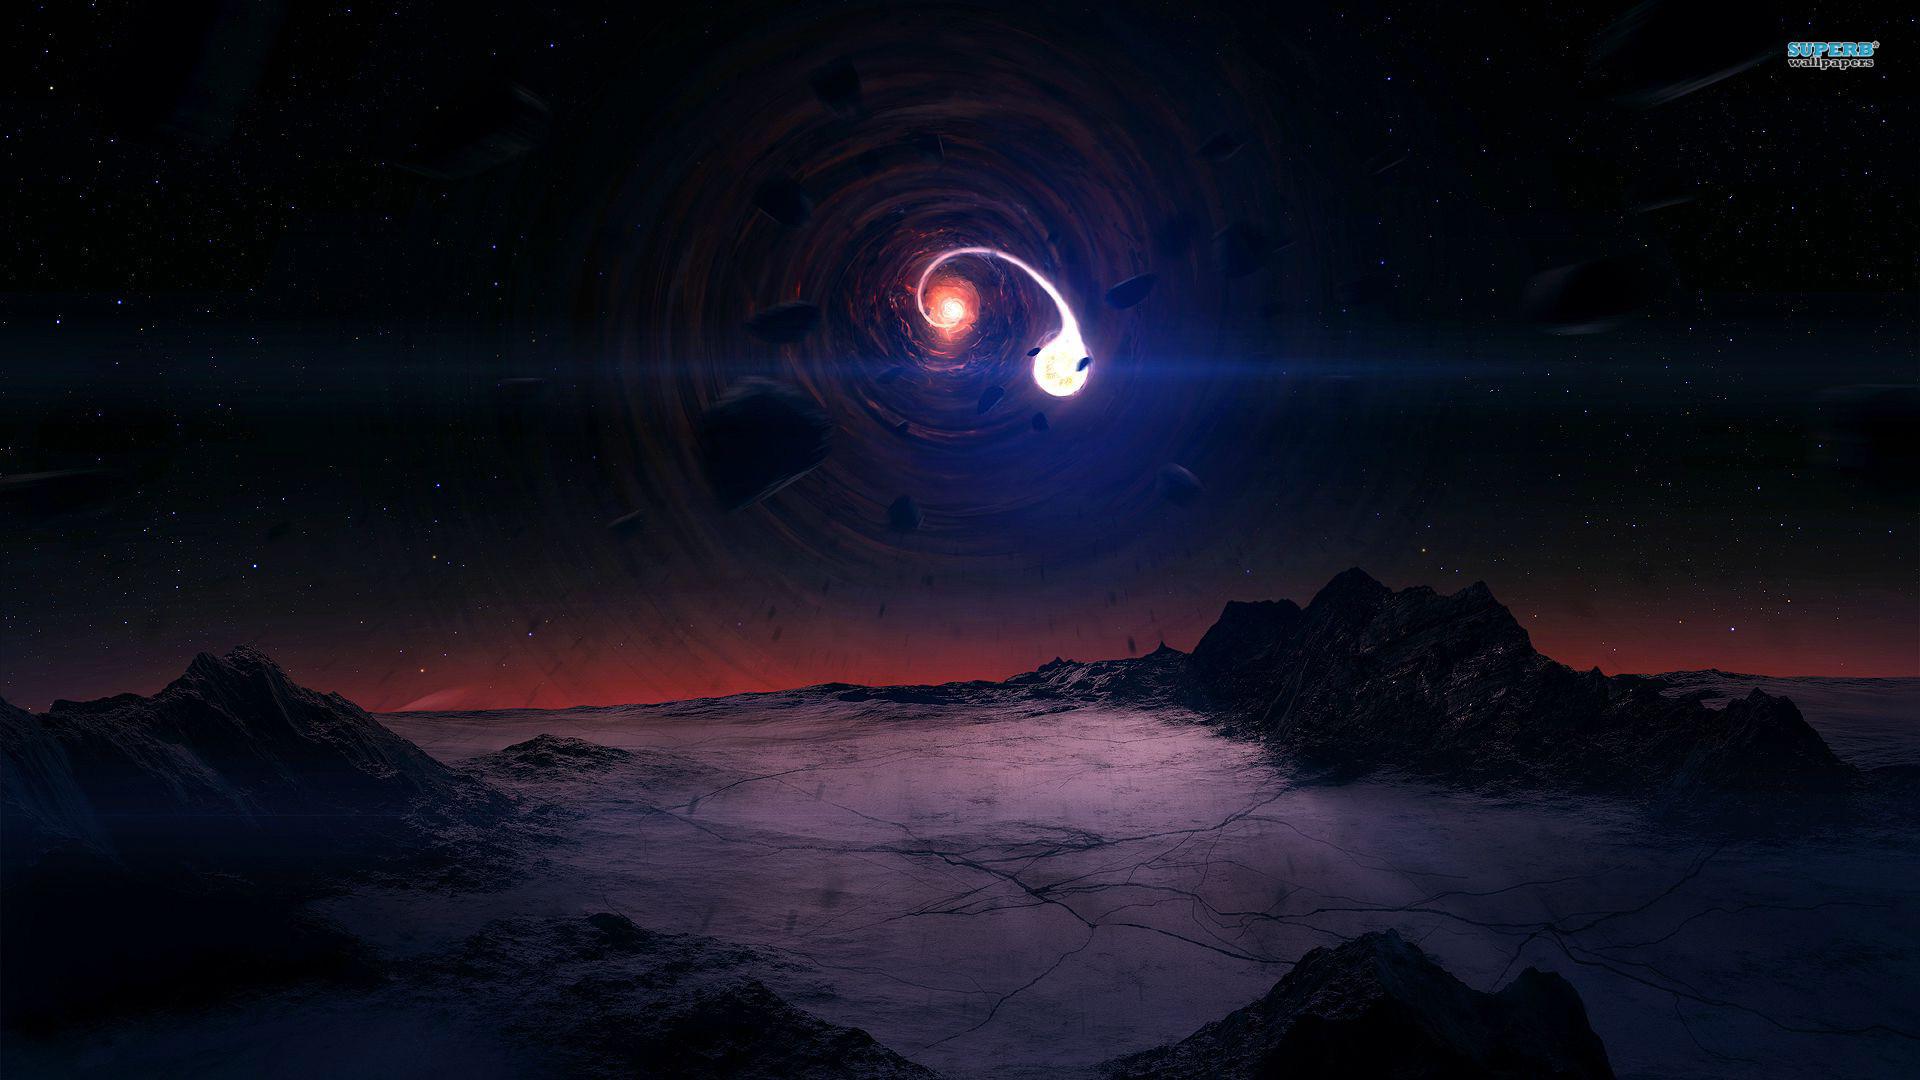 Interstellar Black Hole Gargantua HD desktop wallpaper High   HD Wallpapers    Pinterest   Wallpaper